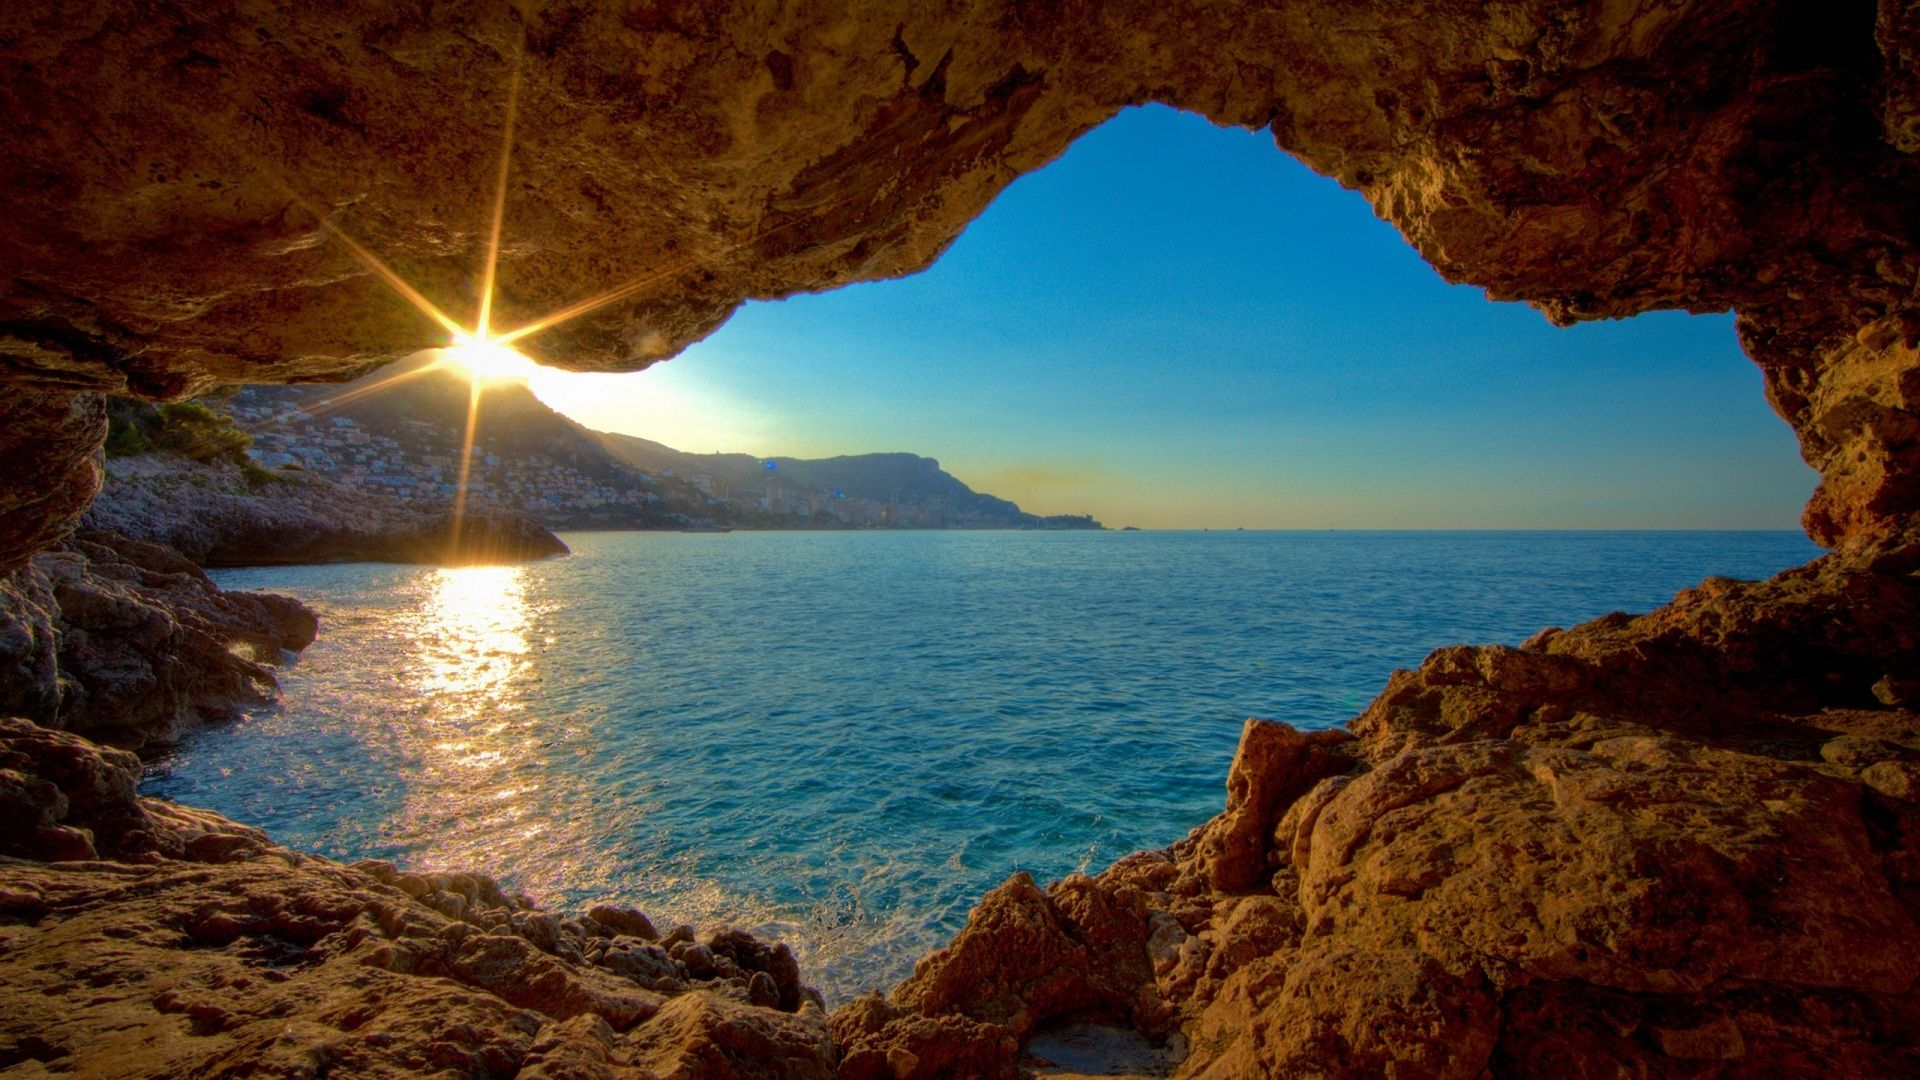 Beautiful Wallpapers Of Sea